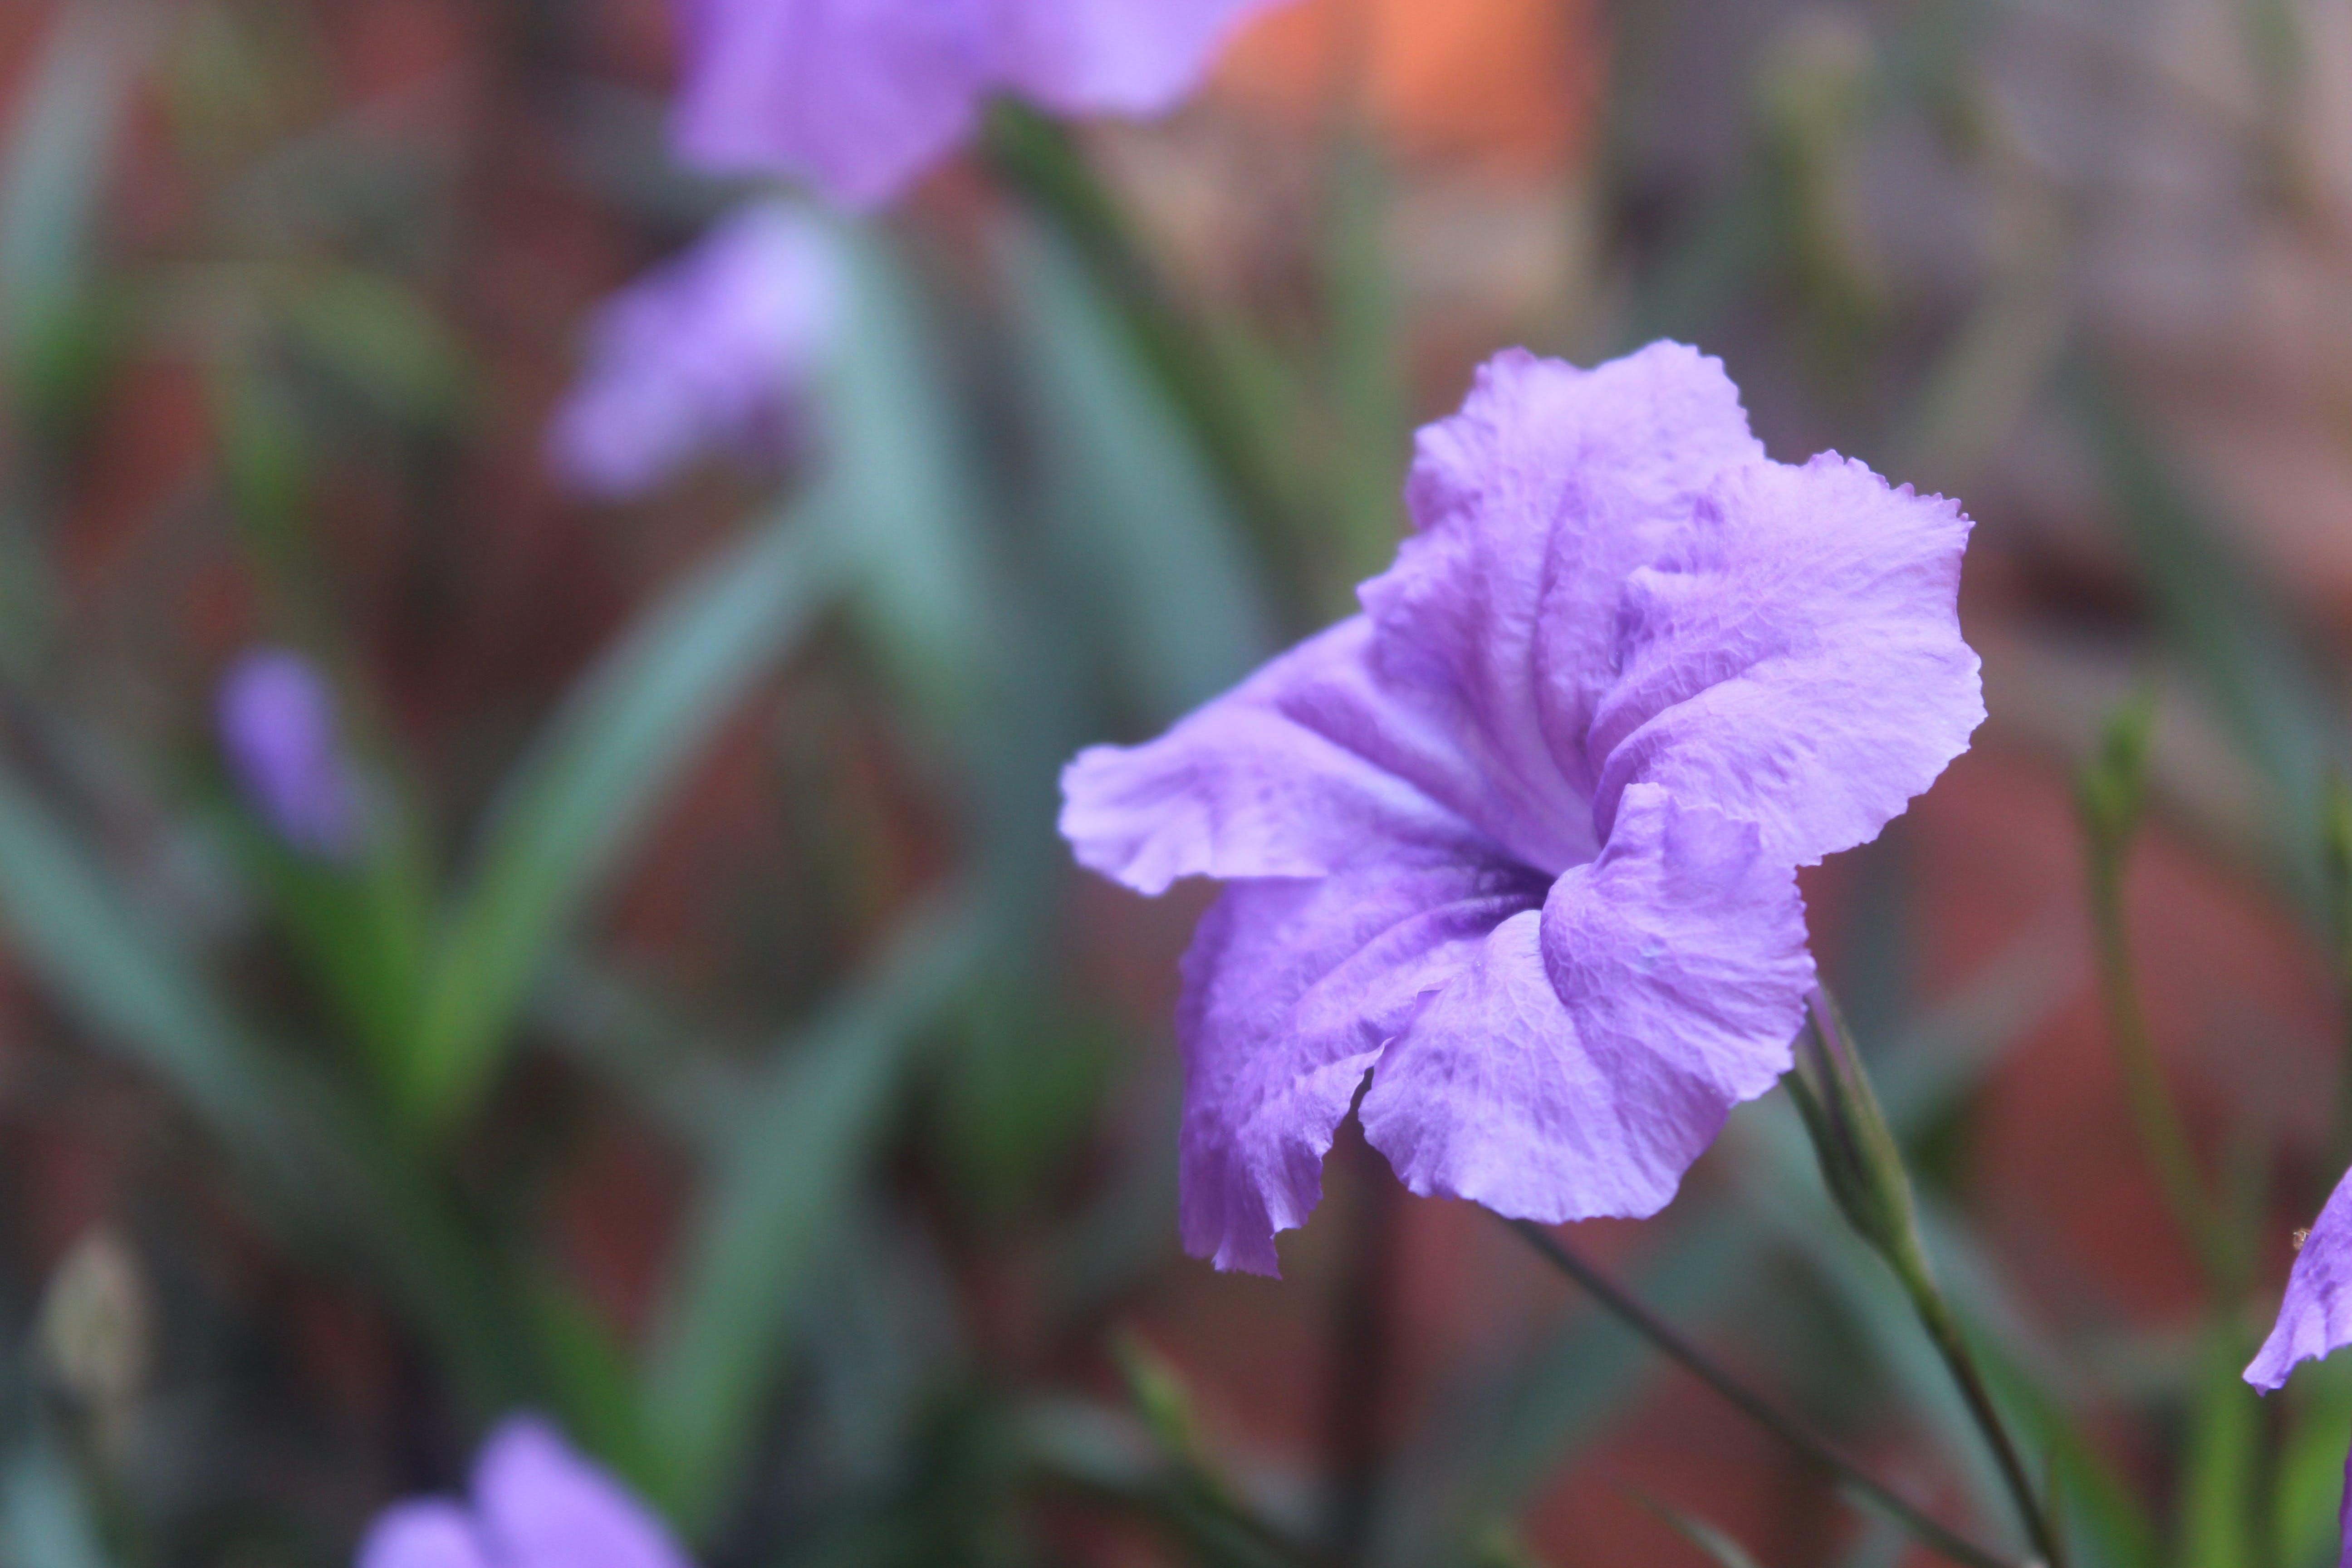 Free stock photo of flower, purple flowers